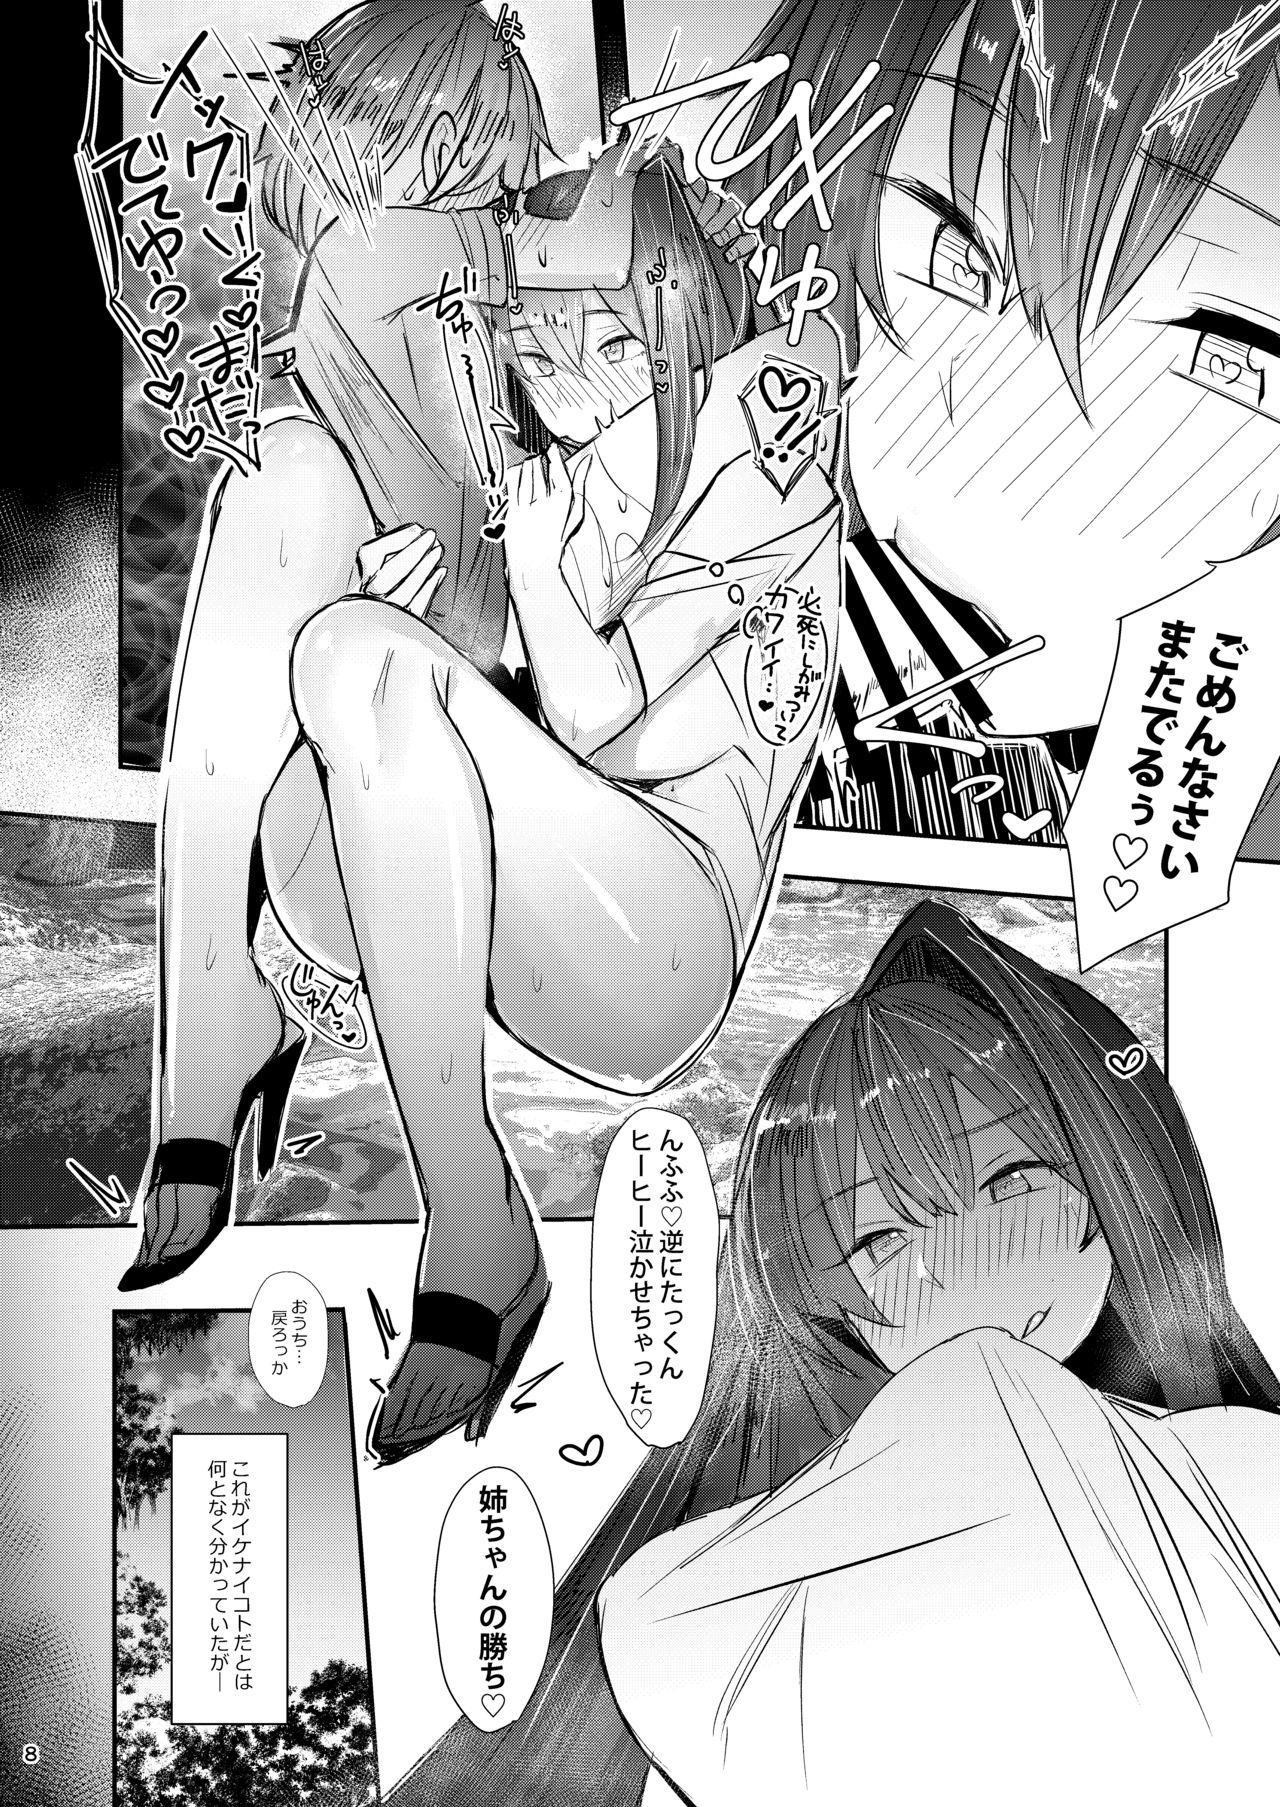 [L.G.C. (Rib:y(uhki))] Onee-chan wa Uchuu. - My elder sister is the universe. [Digital] 6